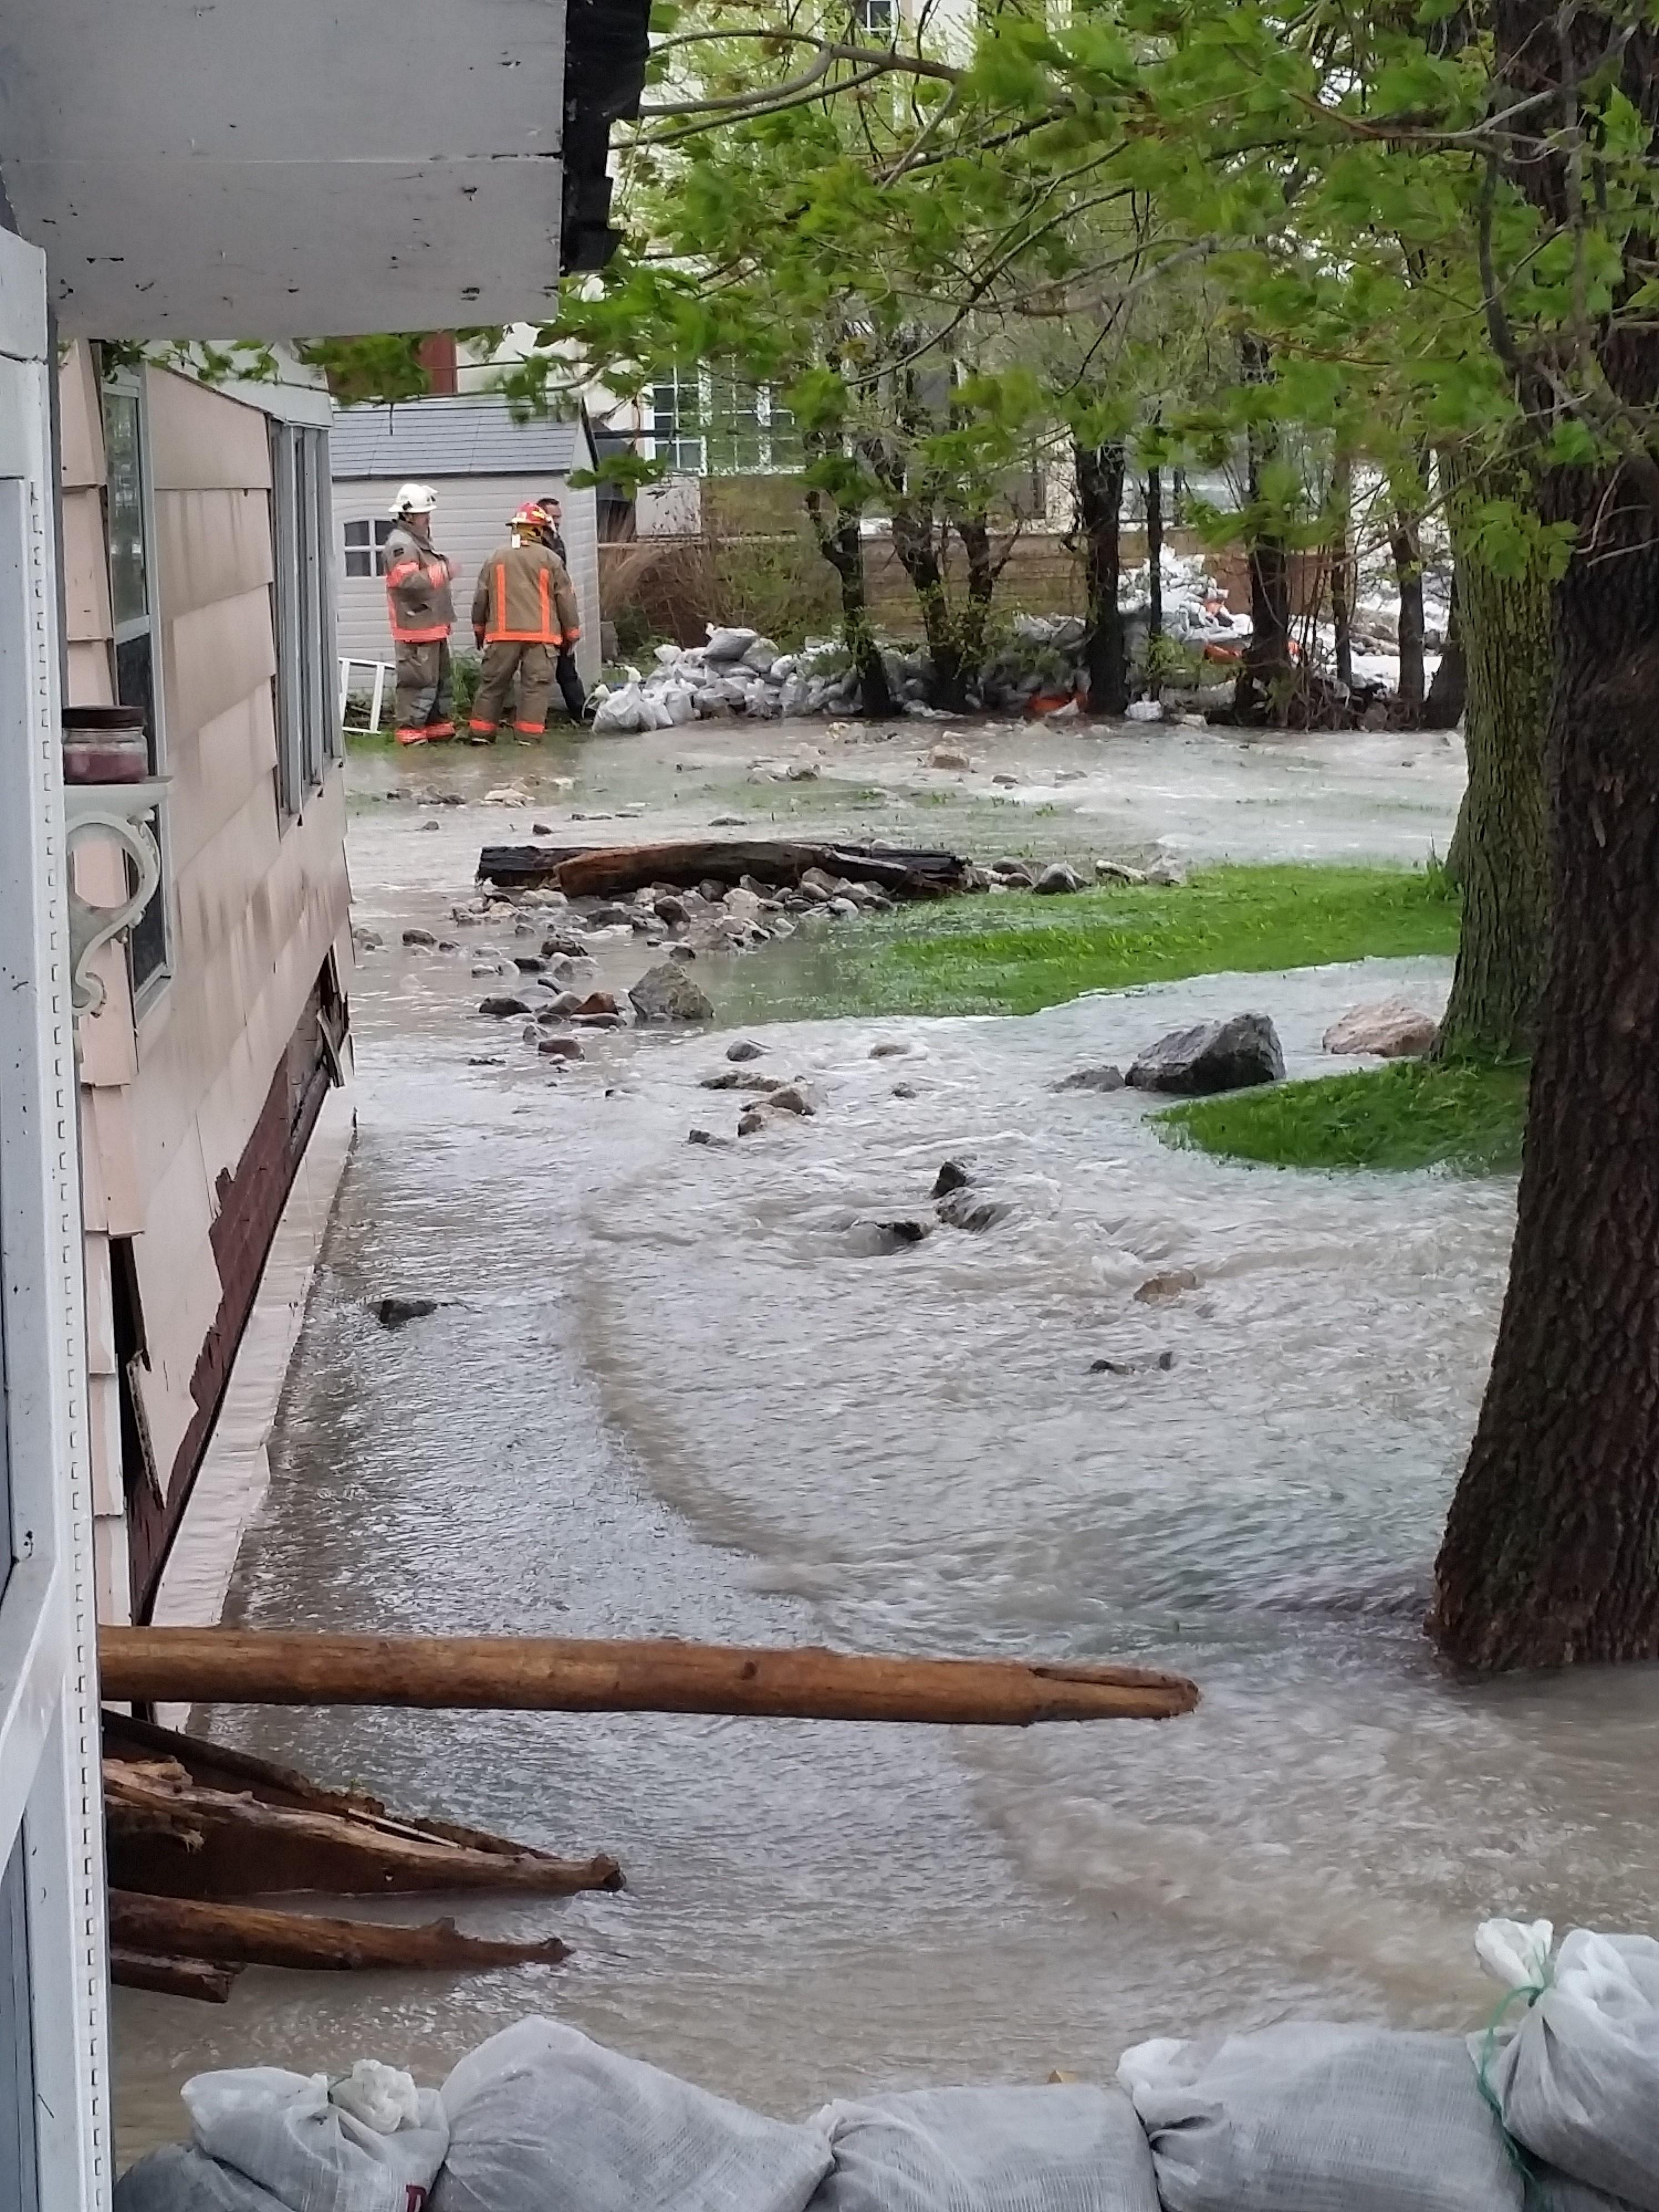 Flood waters at Cedar Crest Beach area